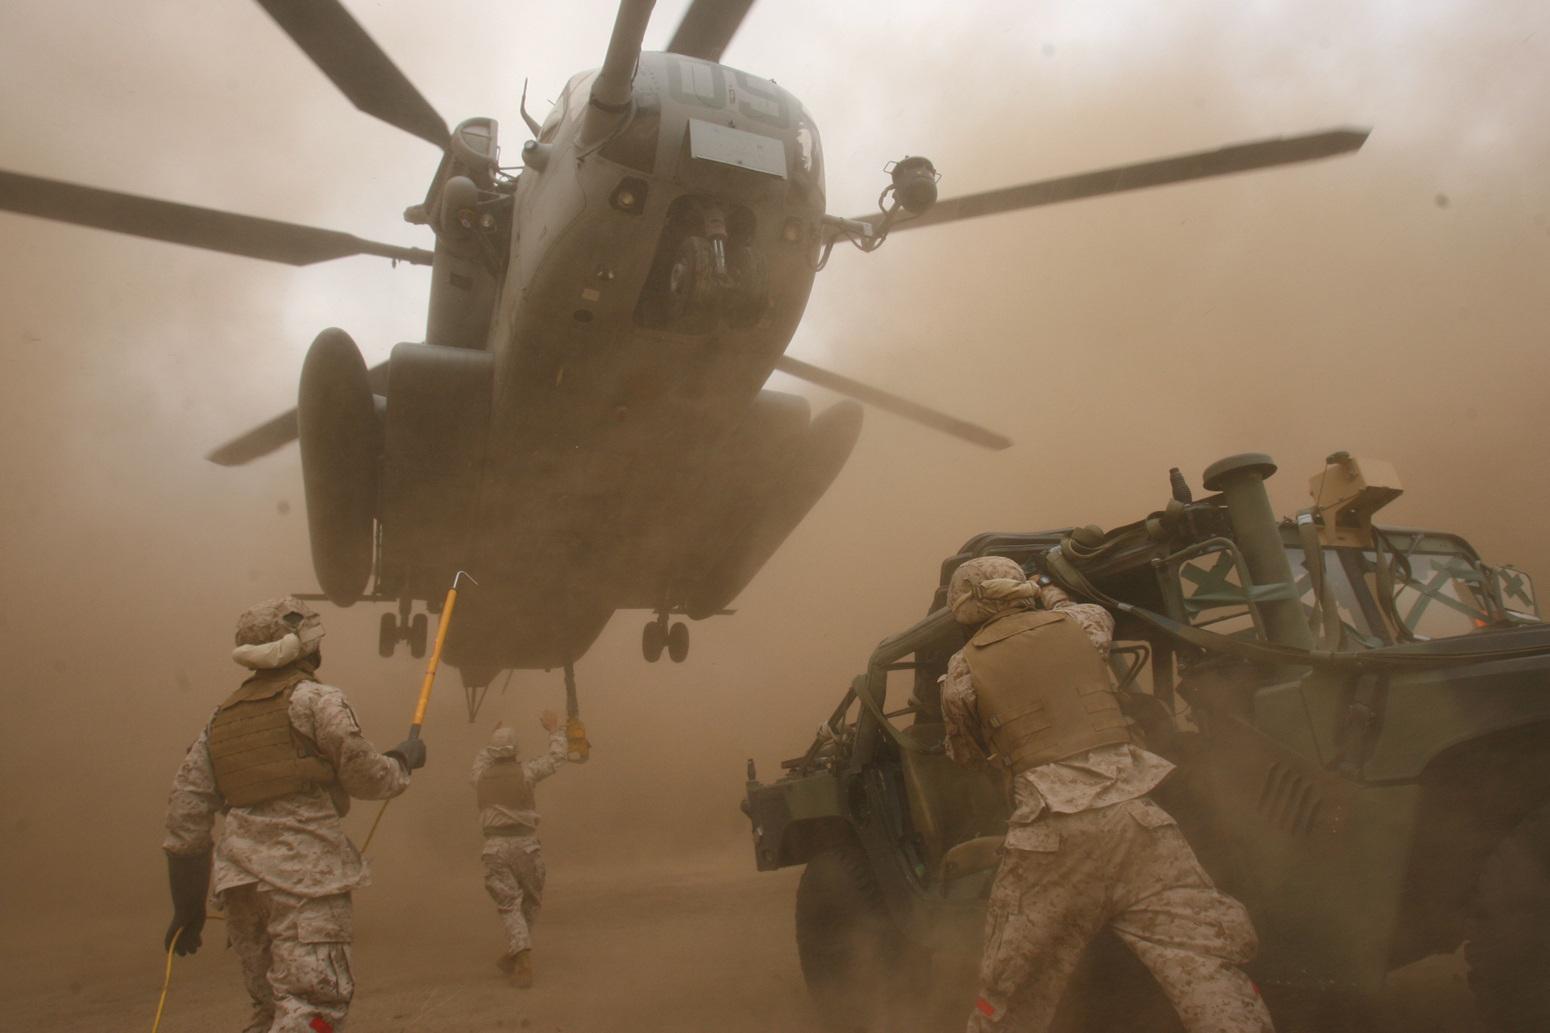 http://2.bp.blogspot.com/-Icwva8nIB9Q/UESxtruxV5I/AAAAAAAABF8/cCtZ8iKUYxg/s1600/military%2Bwallpapers%2Bhd%2B1.jpg